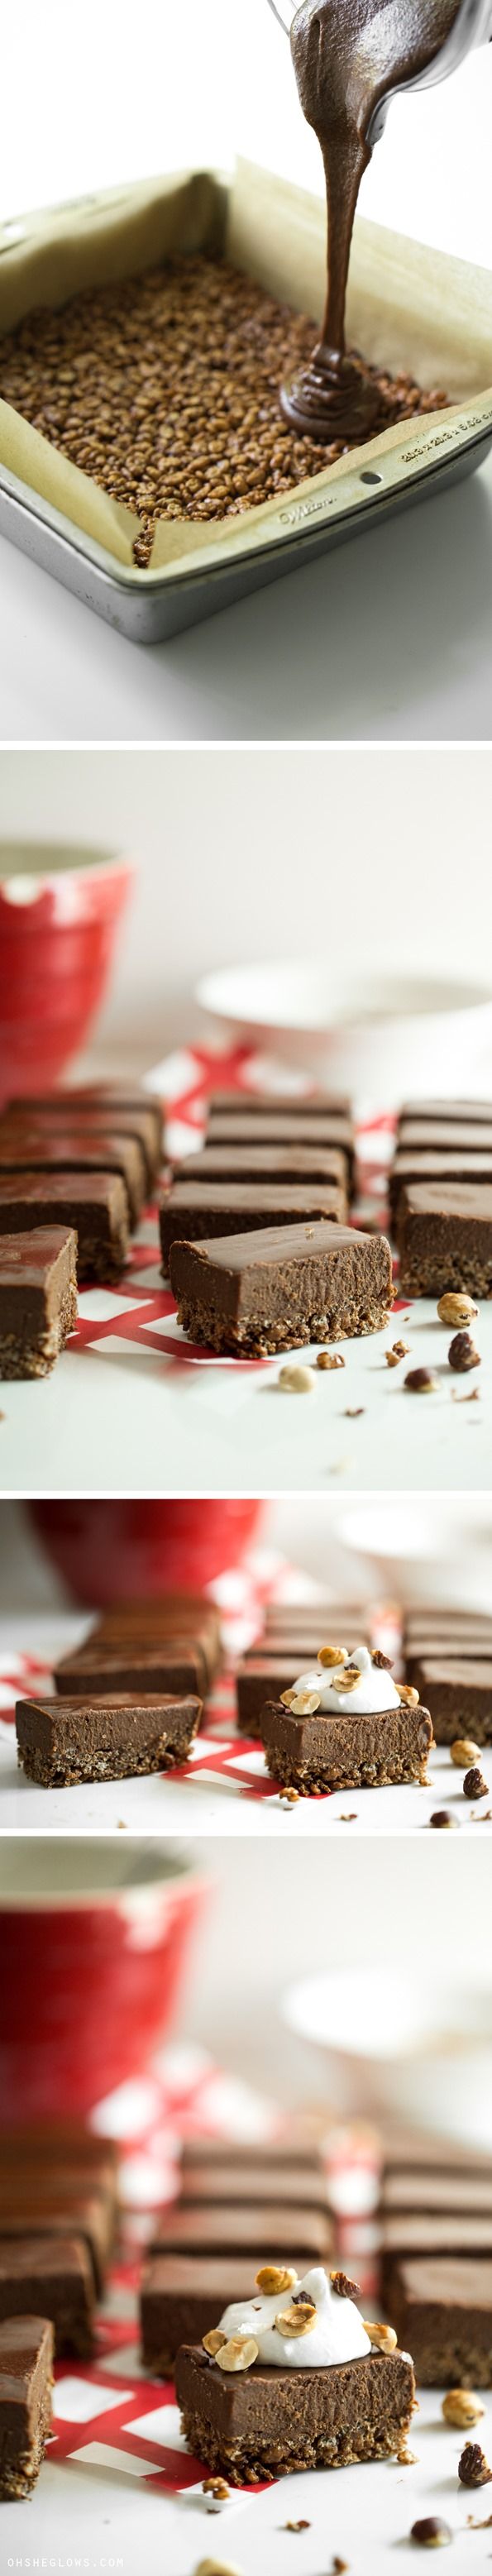 DoubleChocolateCrispyFrozenDessertBars   Double Chocolate Crispy Frozen Dessert Bars (Vegan, GF, No bake)